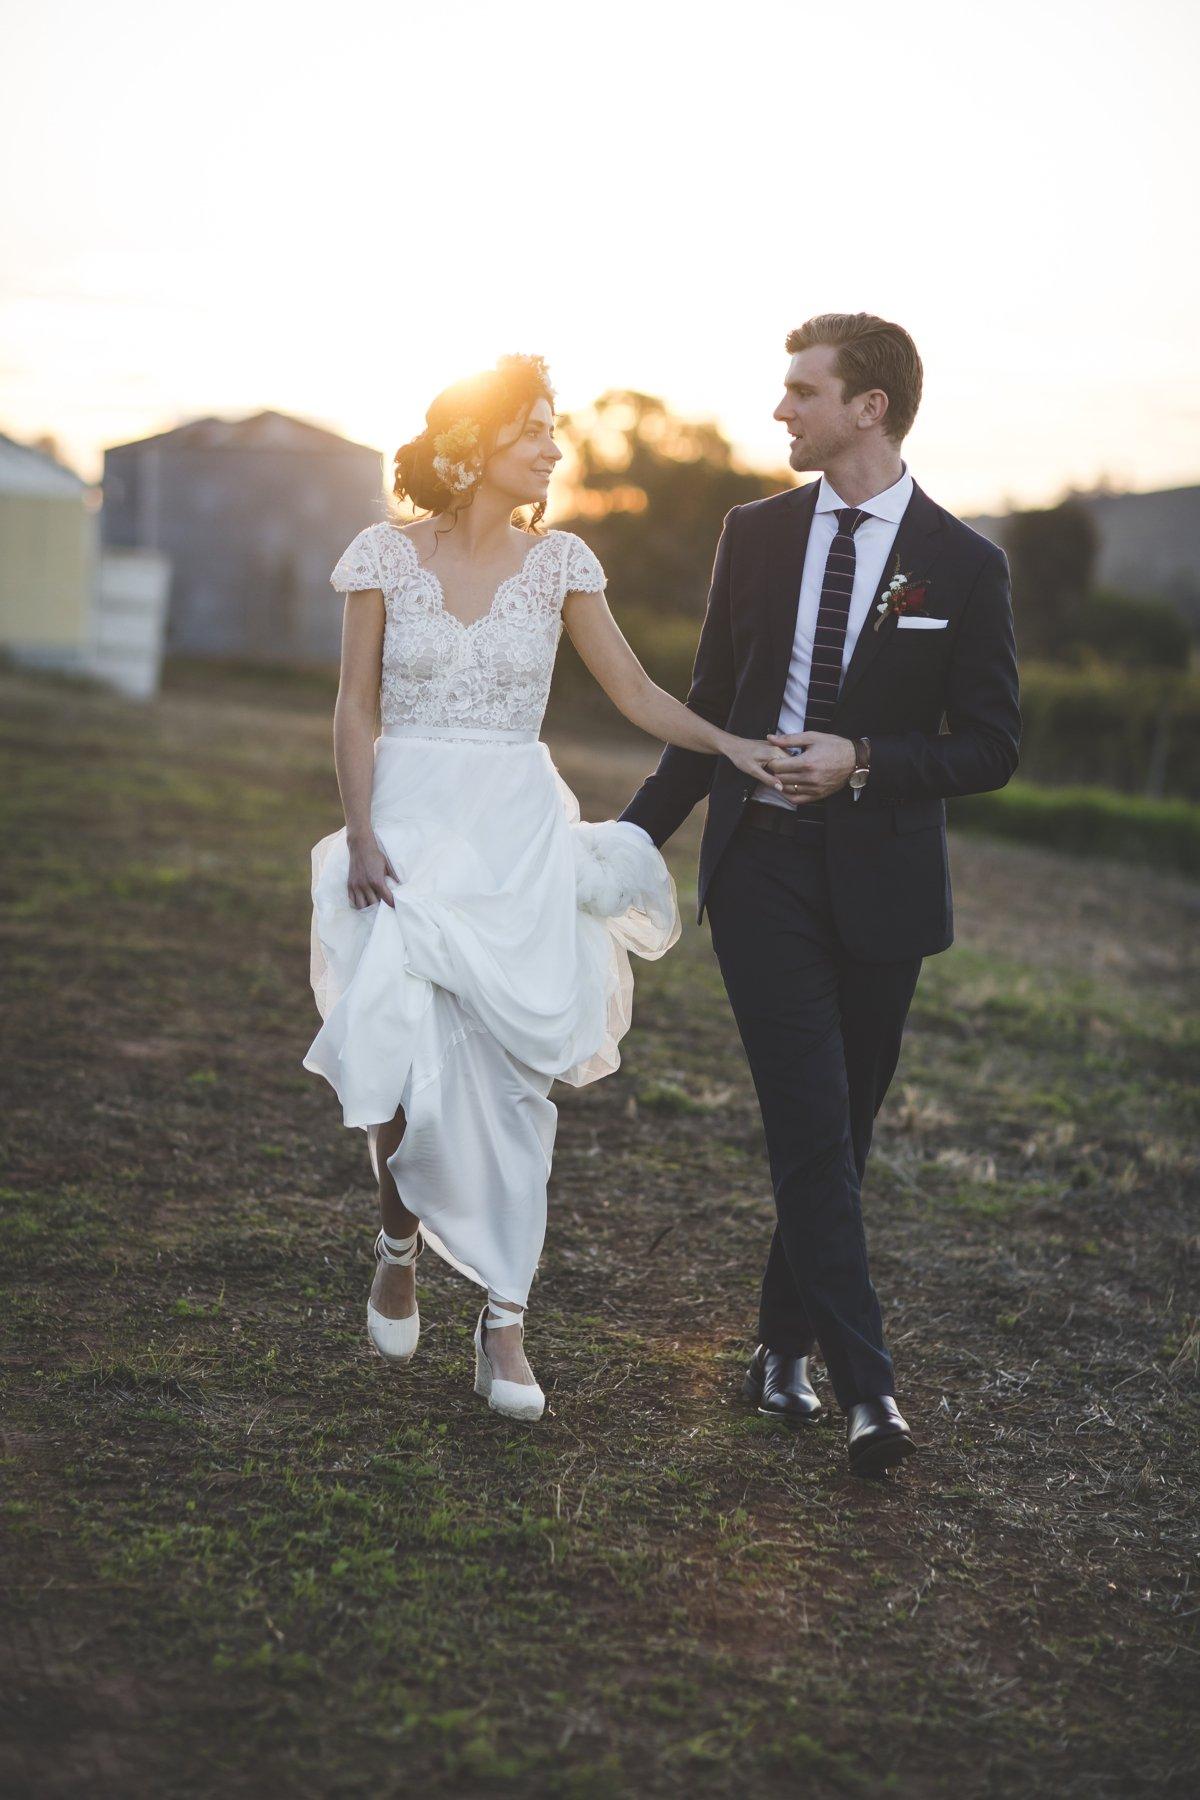 Wagga Wagga Wedding Photographer at Borambola Winery Wagga Wagga Albury wedding photographer Culcairn wedding venue_1132